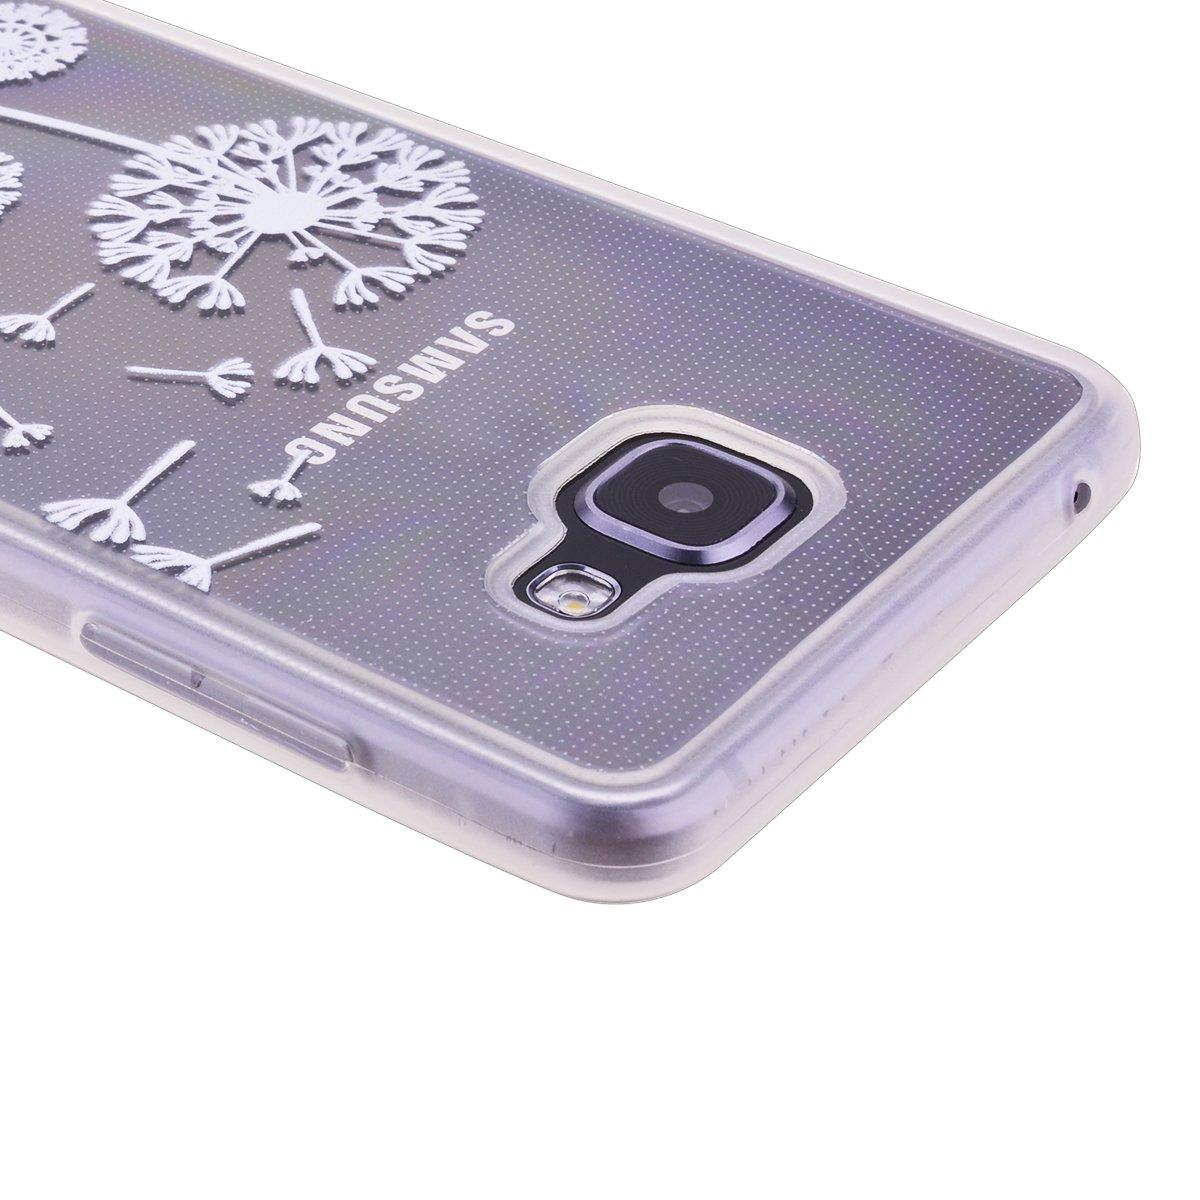 SmartLegend Souple Silicone Coque pour Samsung Galaxy A5 2016 Scrub Skidproof Ultra Thin TPU Hull Etui Mode Extr/êmement Mince L/ég/ère Flexible Housse Soft Bumper Case Protection Cover Anti Choc Fine-Dandelion